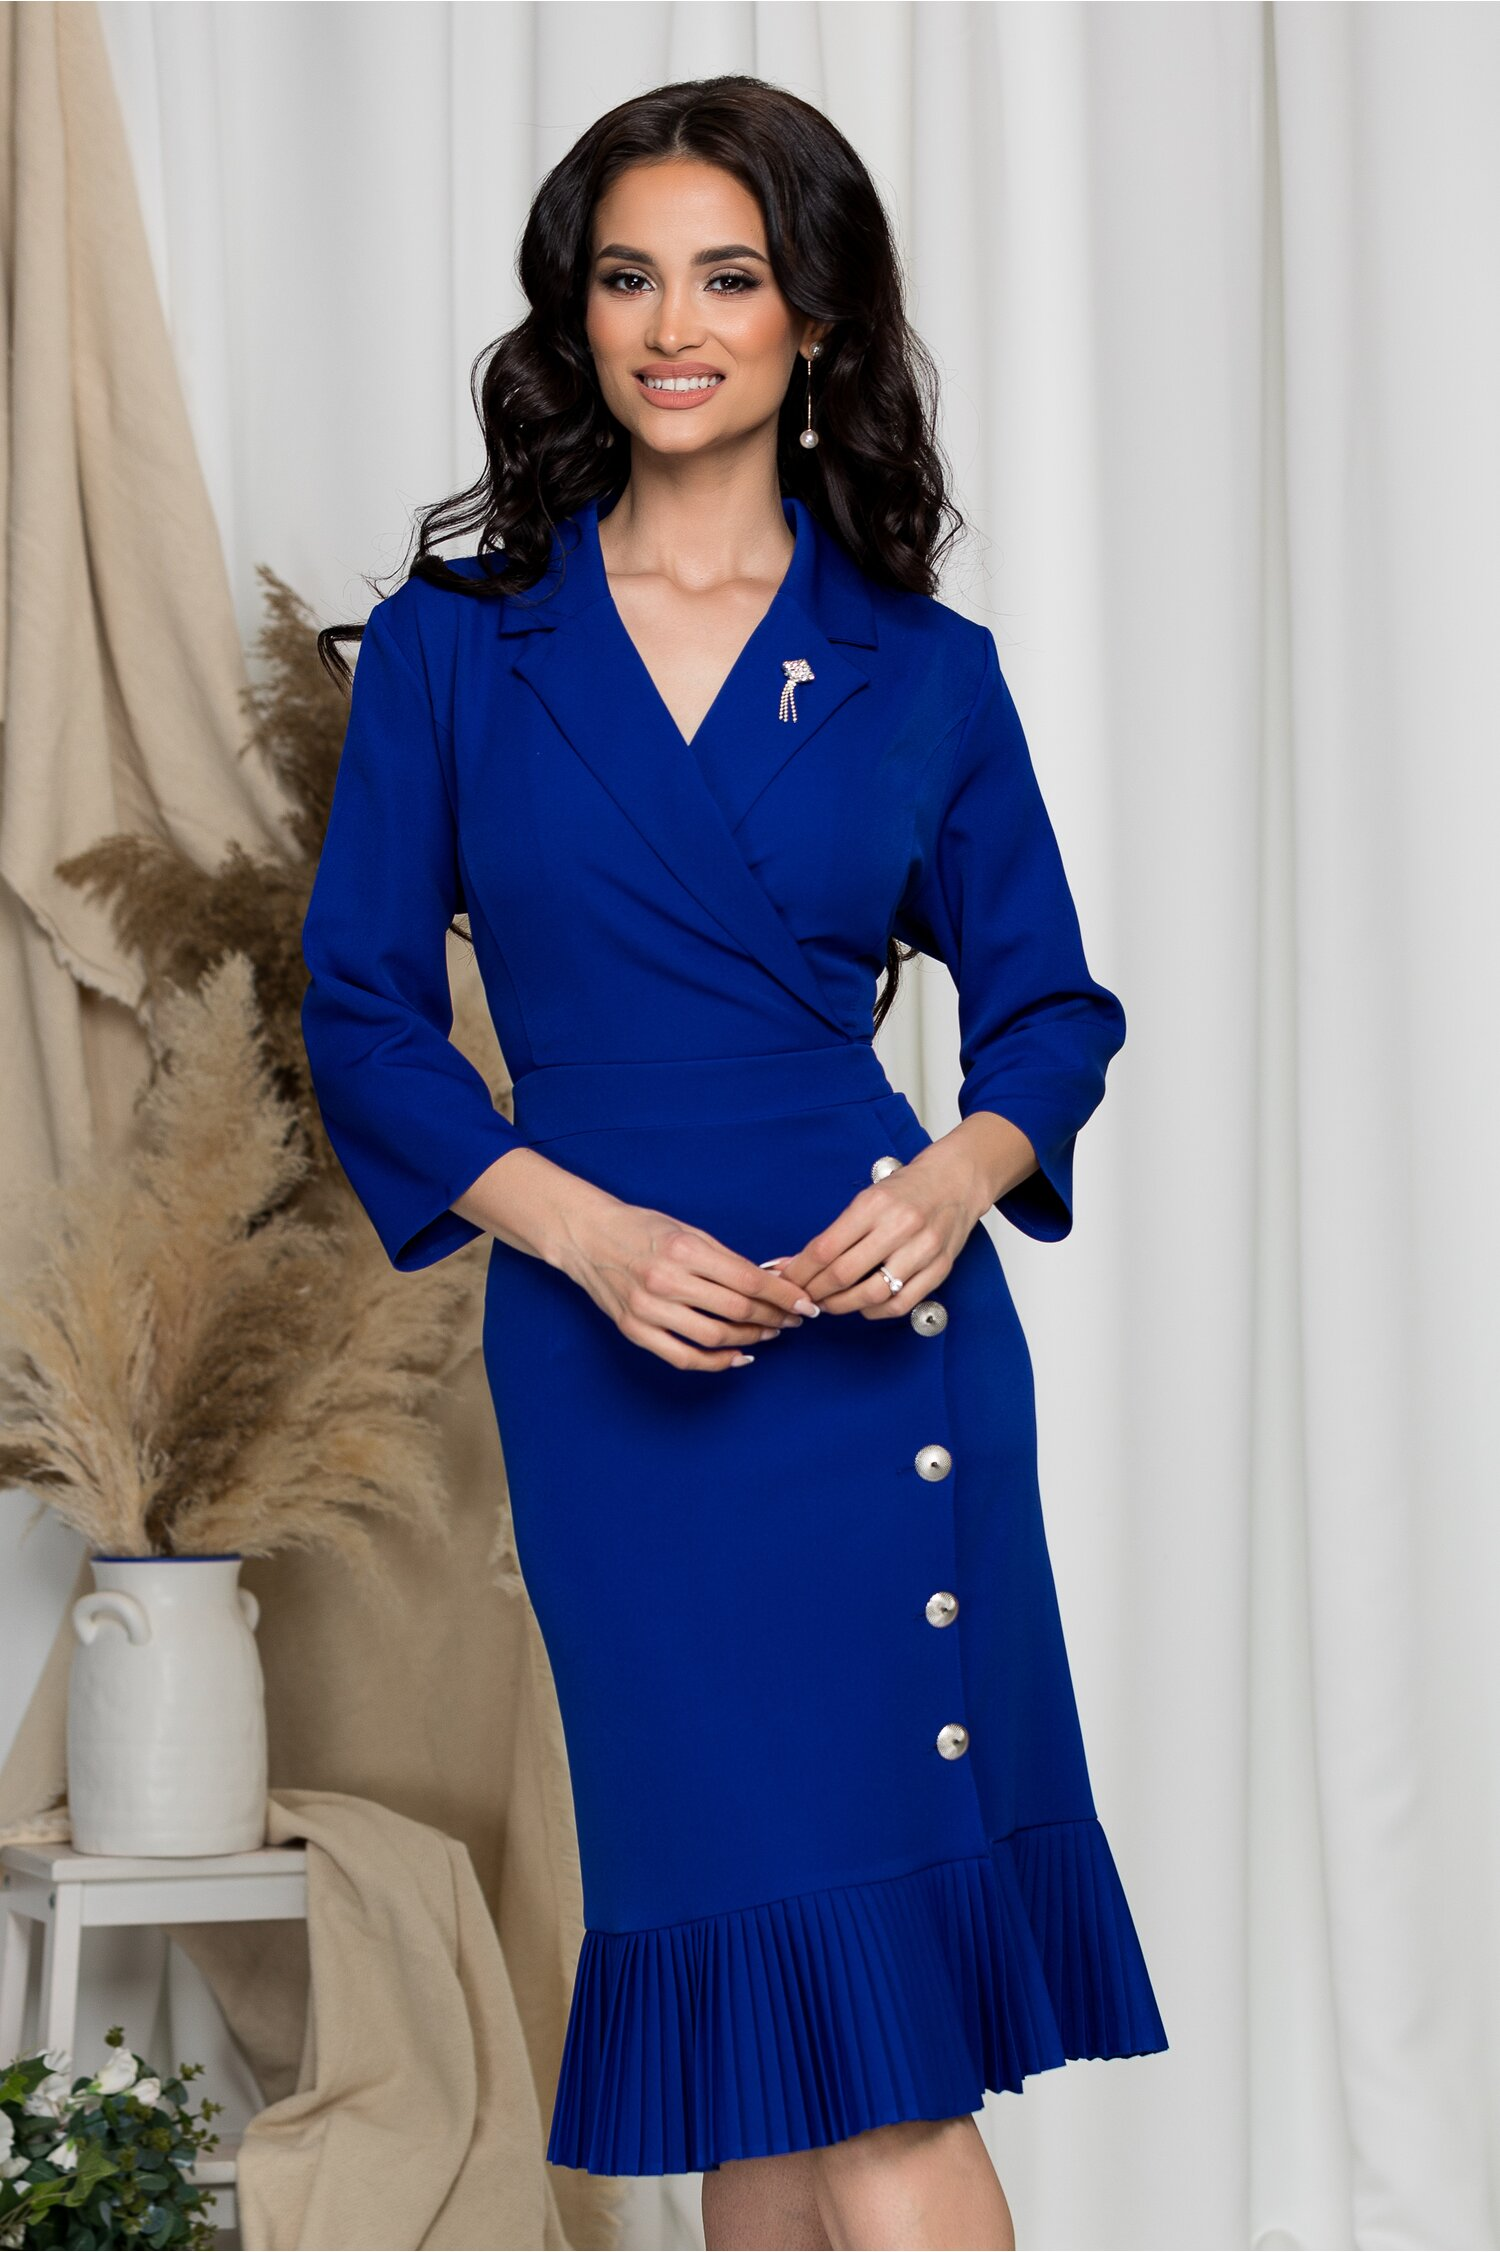 Rochie Simina albastra cu nasturi pe fusta si volan la baza imagine dyfashion.ro 2021